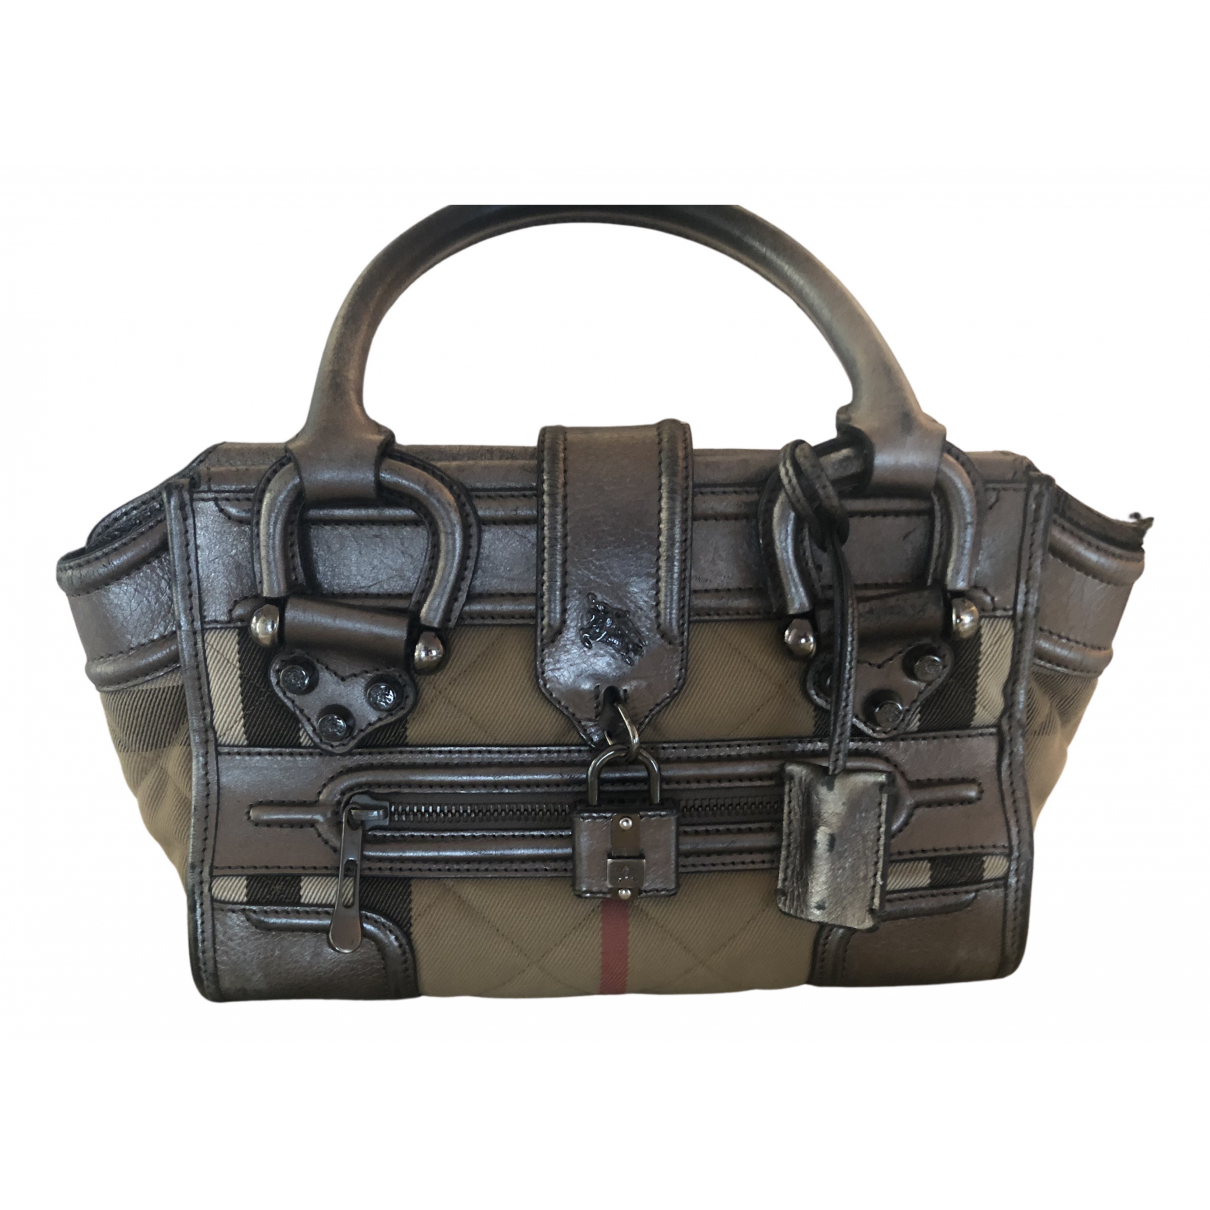 Burberry N Metallic Leather handbag for Women N